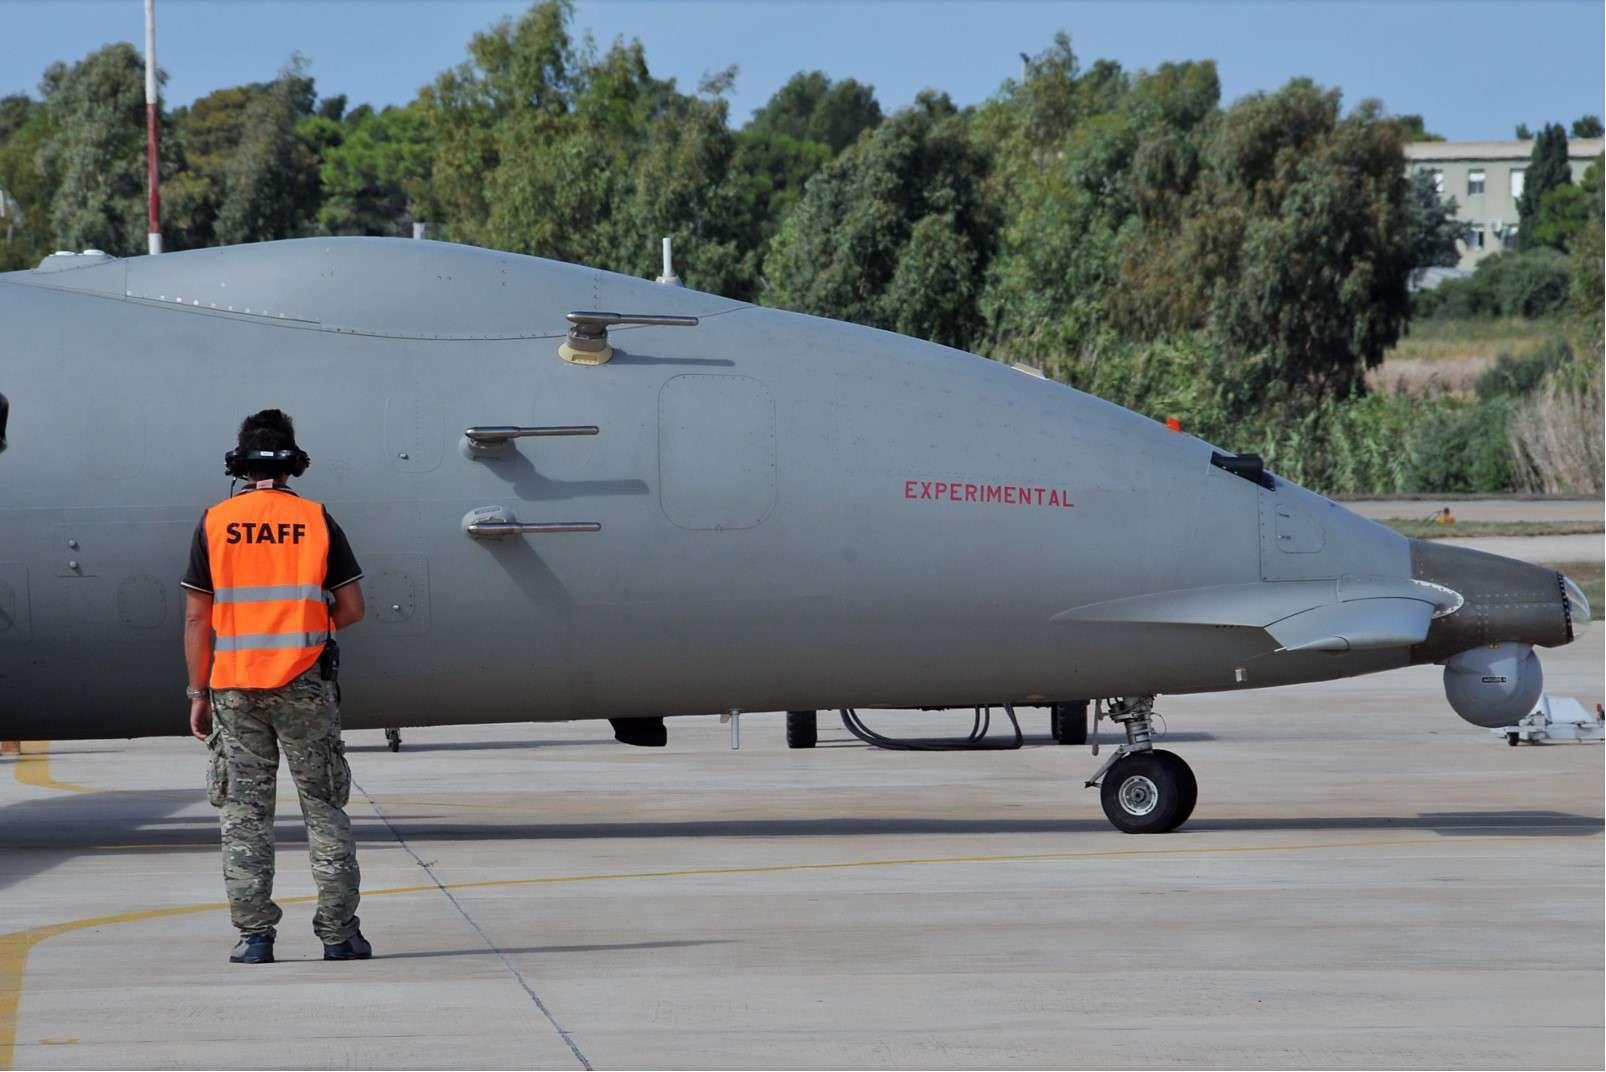 Farnborough International Airshow 16-22 July 2018, Piaggio remotely-piloted Medium Altitude Long Endurance vehicle